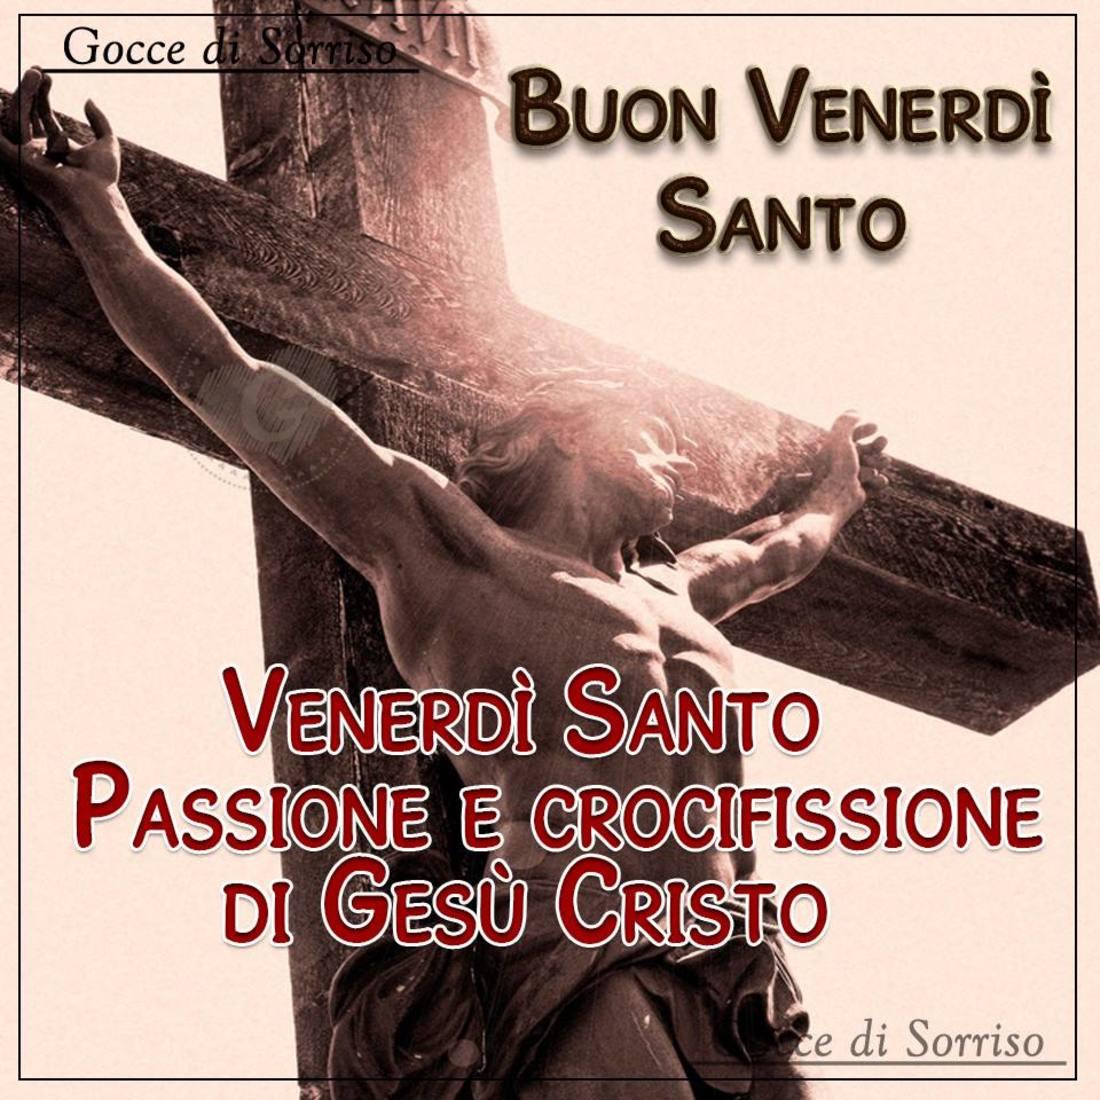 Buon Venerdi Santo Immagini Gratis Bellissimeimmagini It